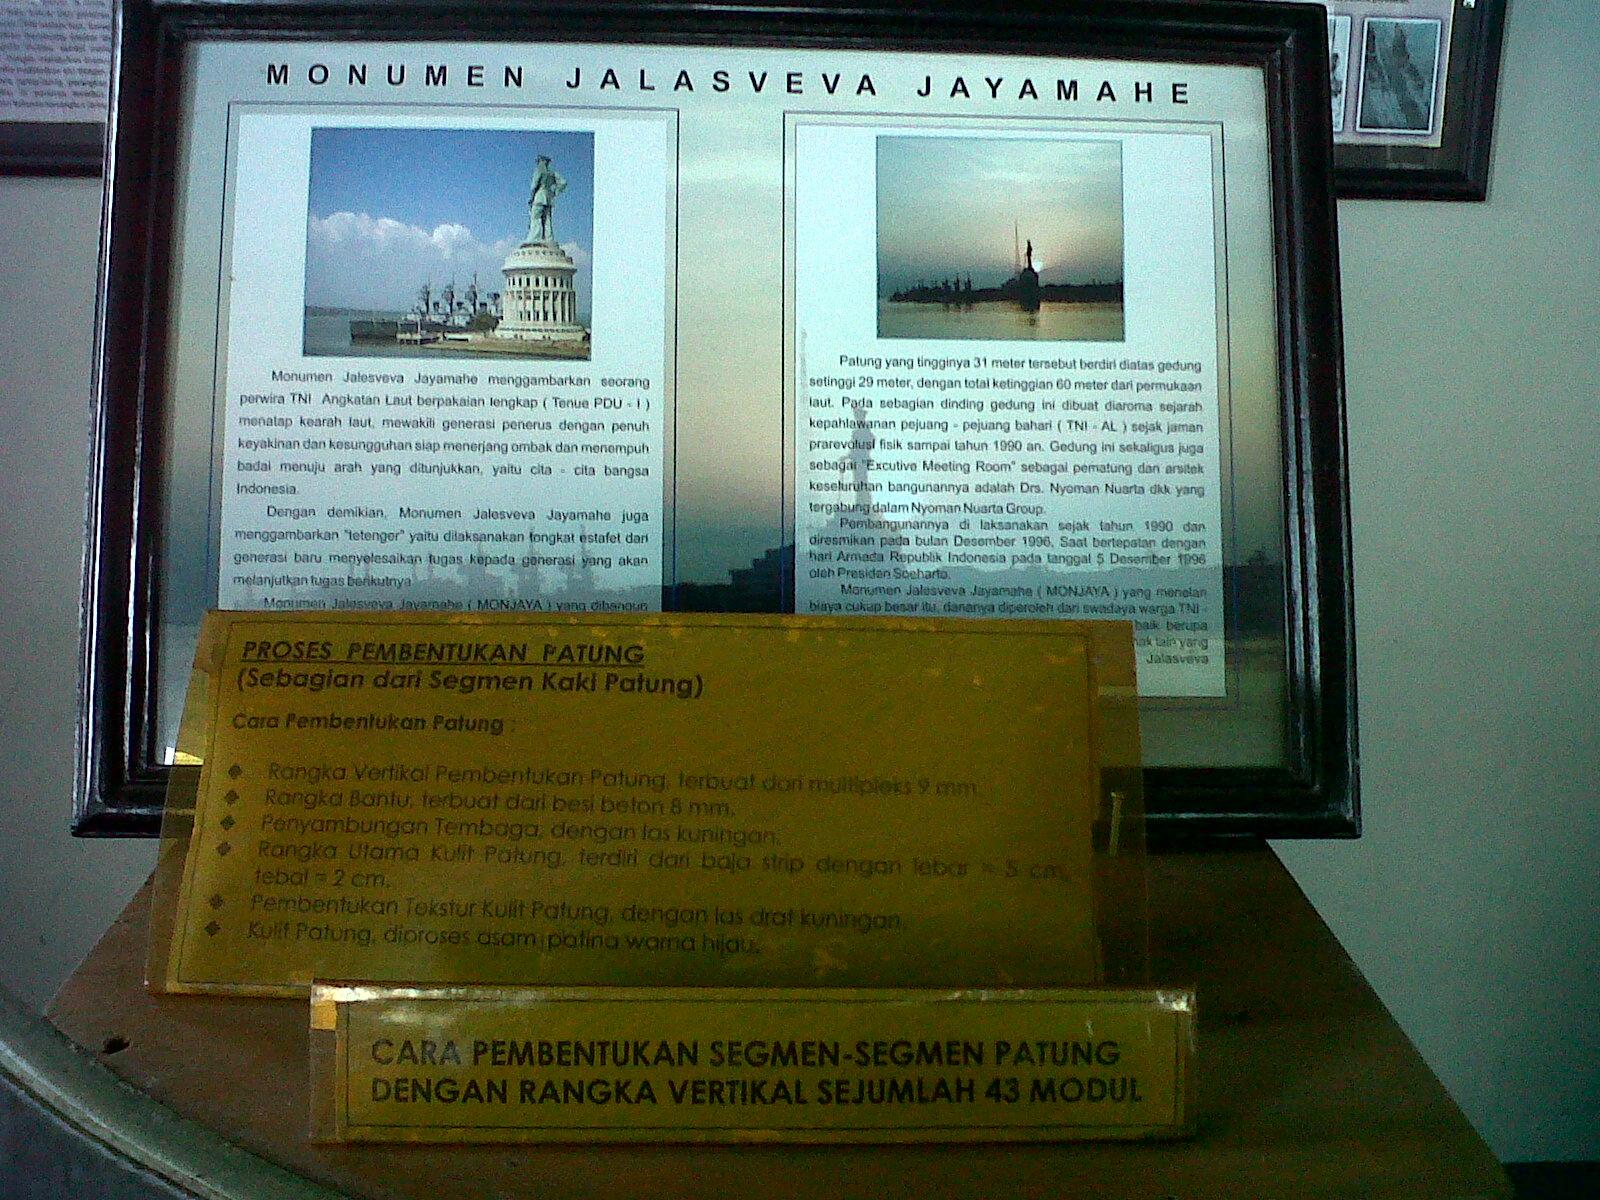 Monumen Jalesveva Jayamahe Lambang Kejayaan Laut Indonesia Wisata 5 Kota